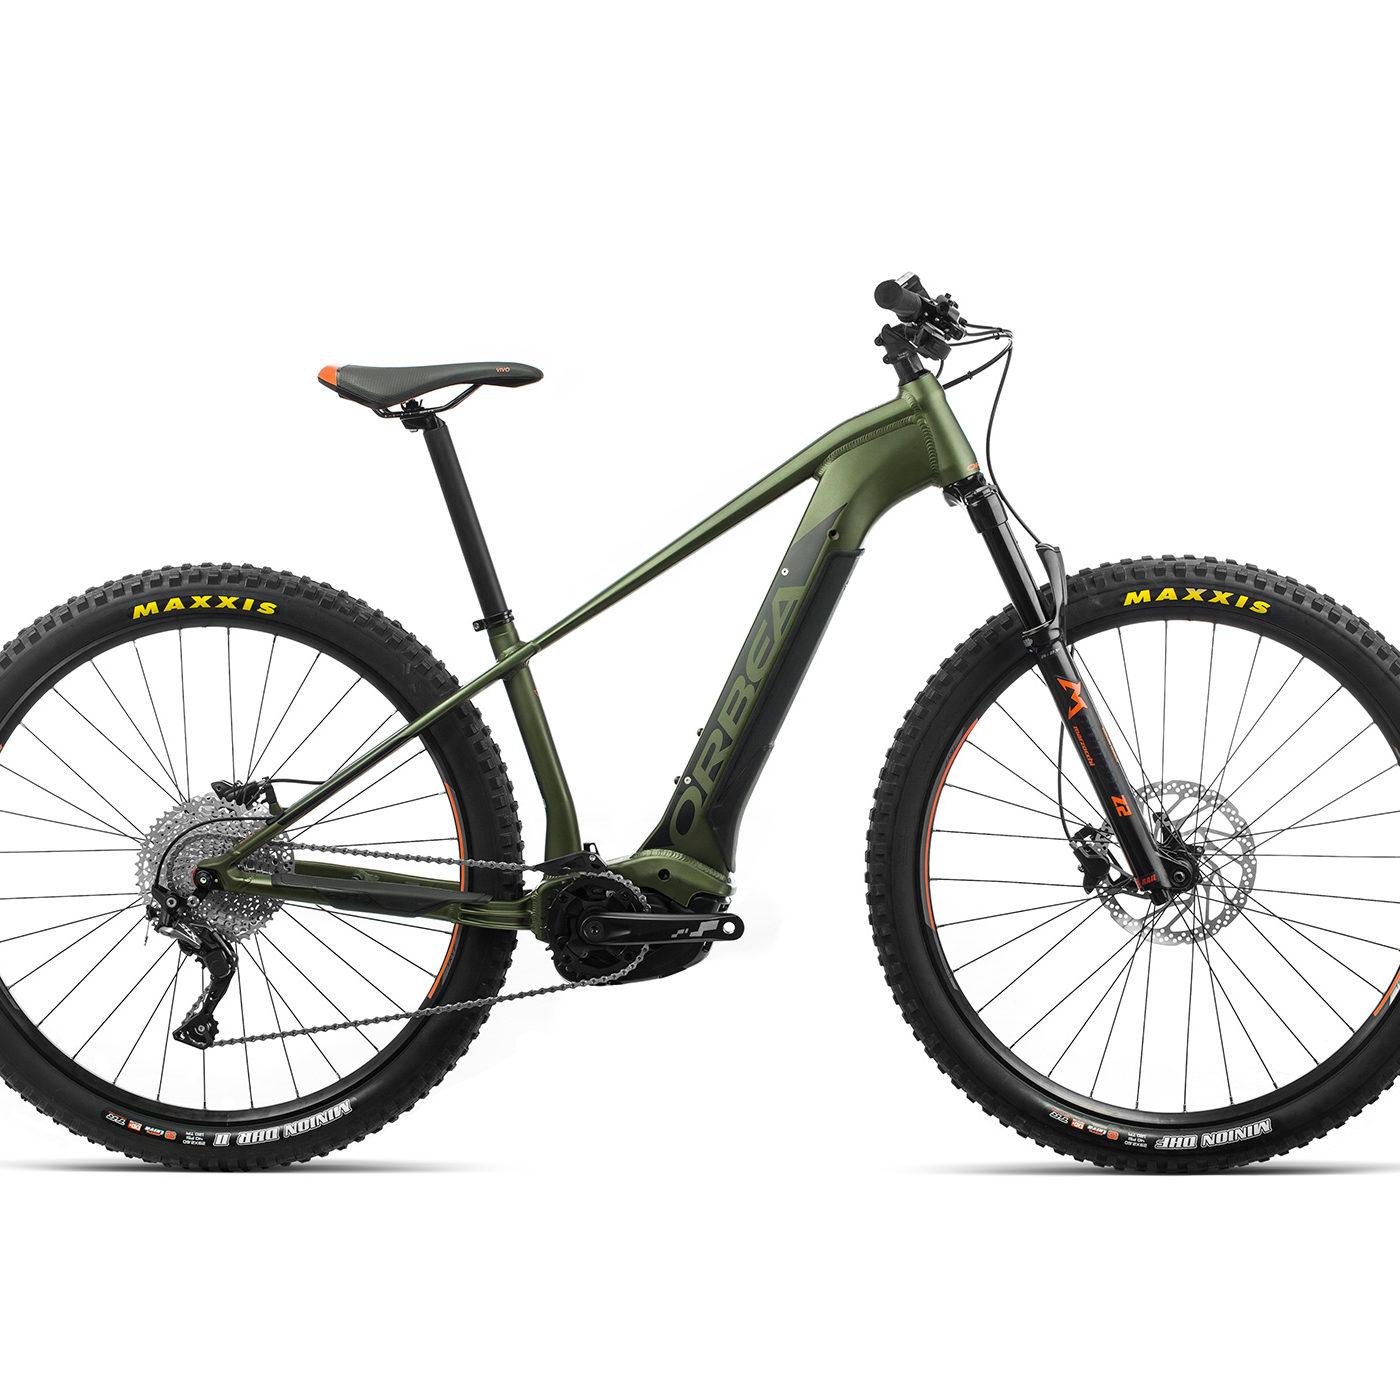 ORBEA WILD HT30 29 ebike - GROEN / ZWART (DOF) @G-Bikes